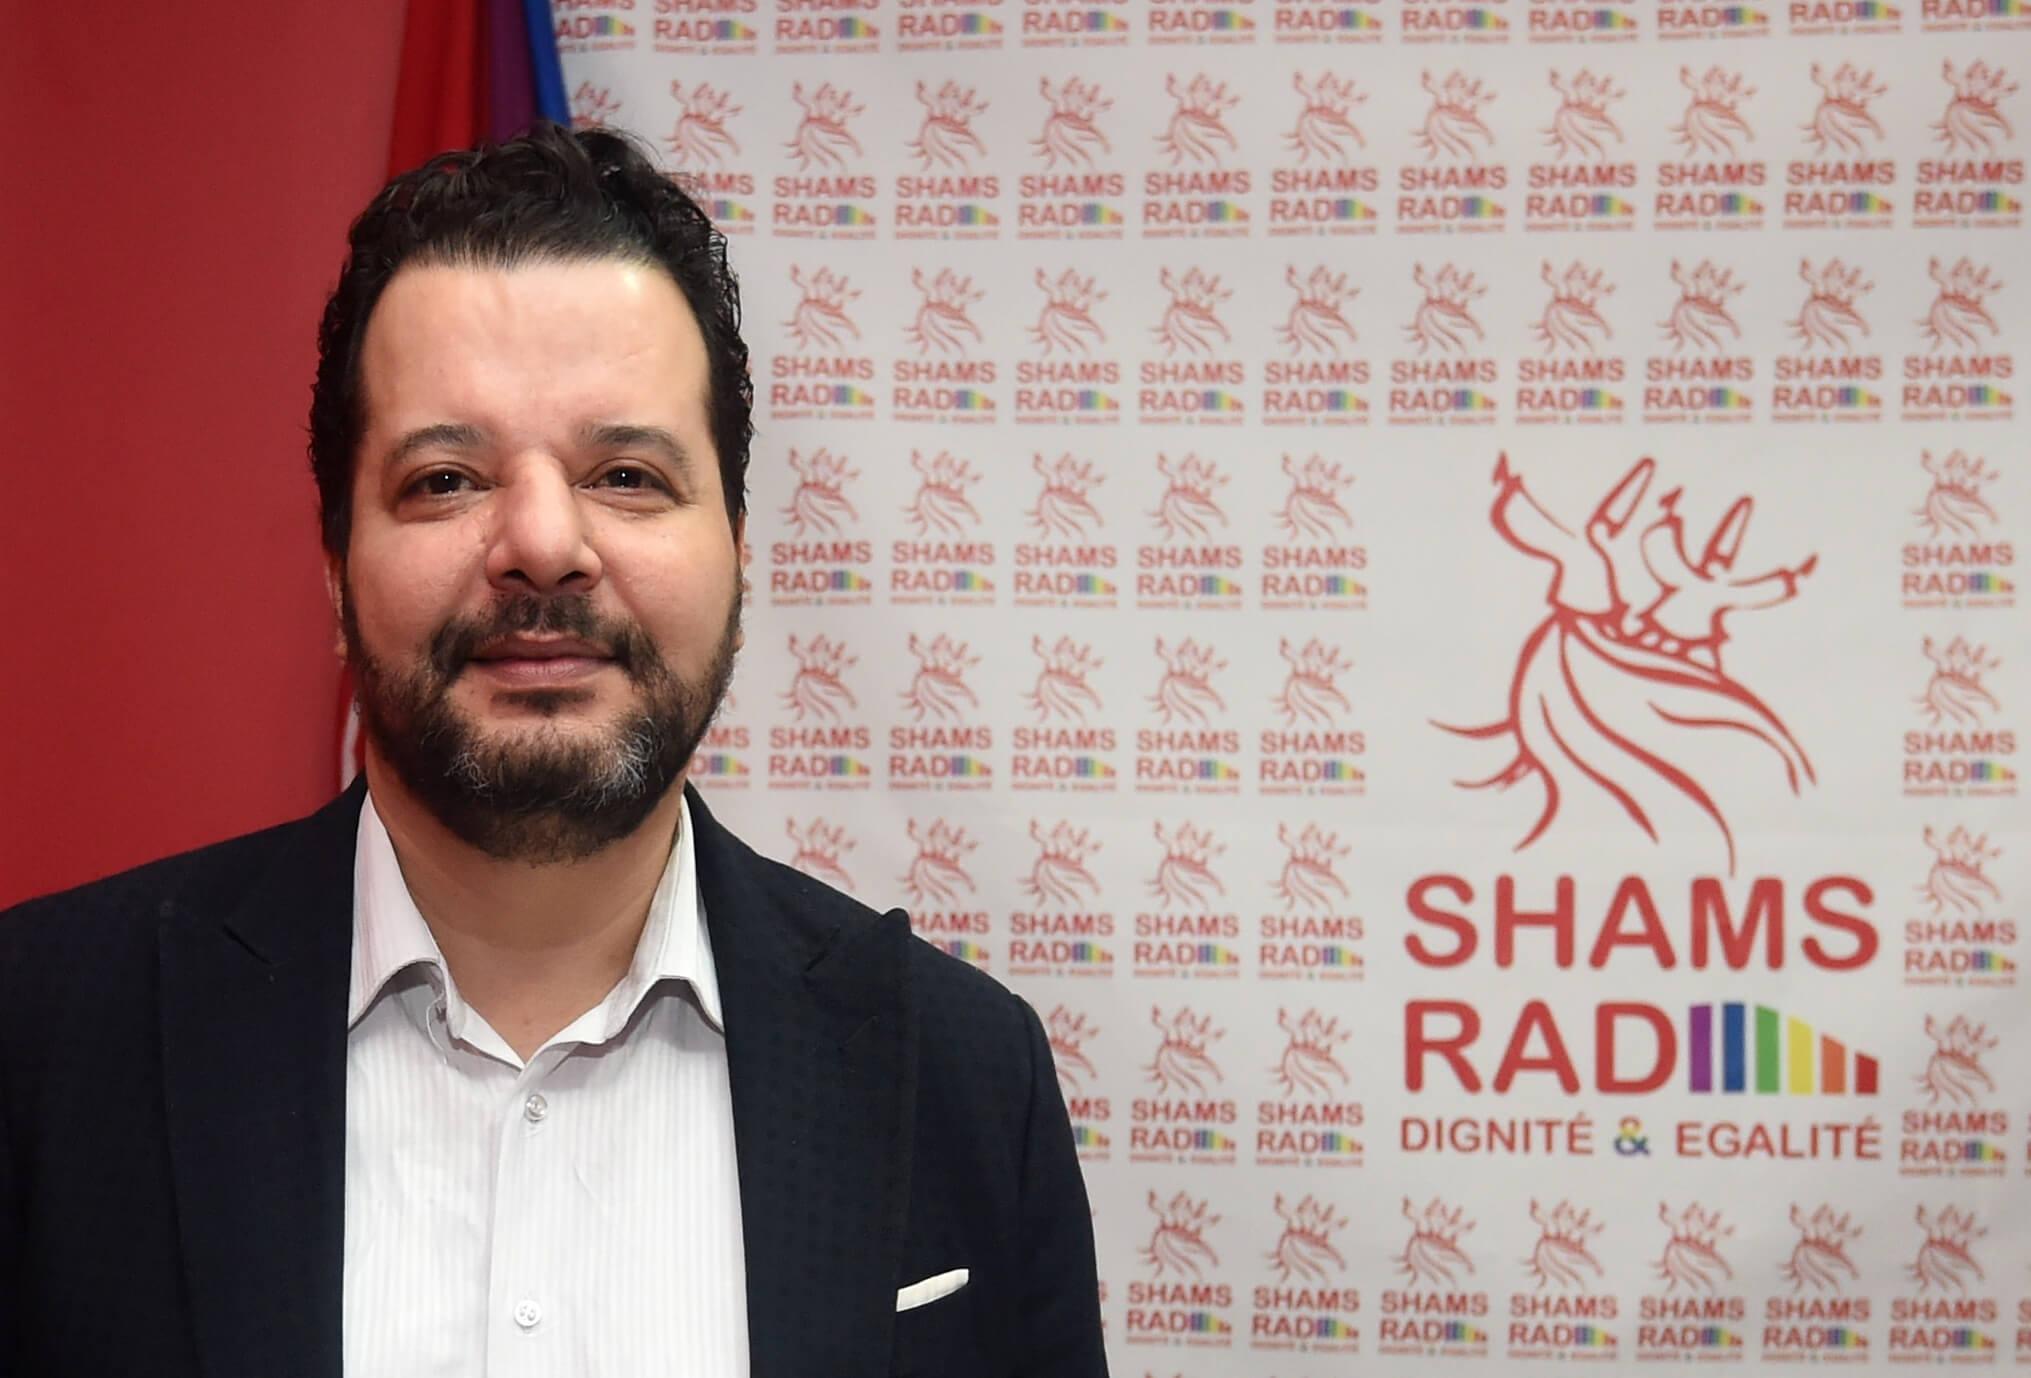 tunisia shams lgbt gay diritti omosessualità